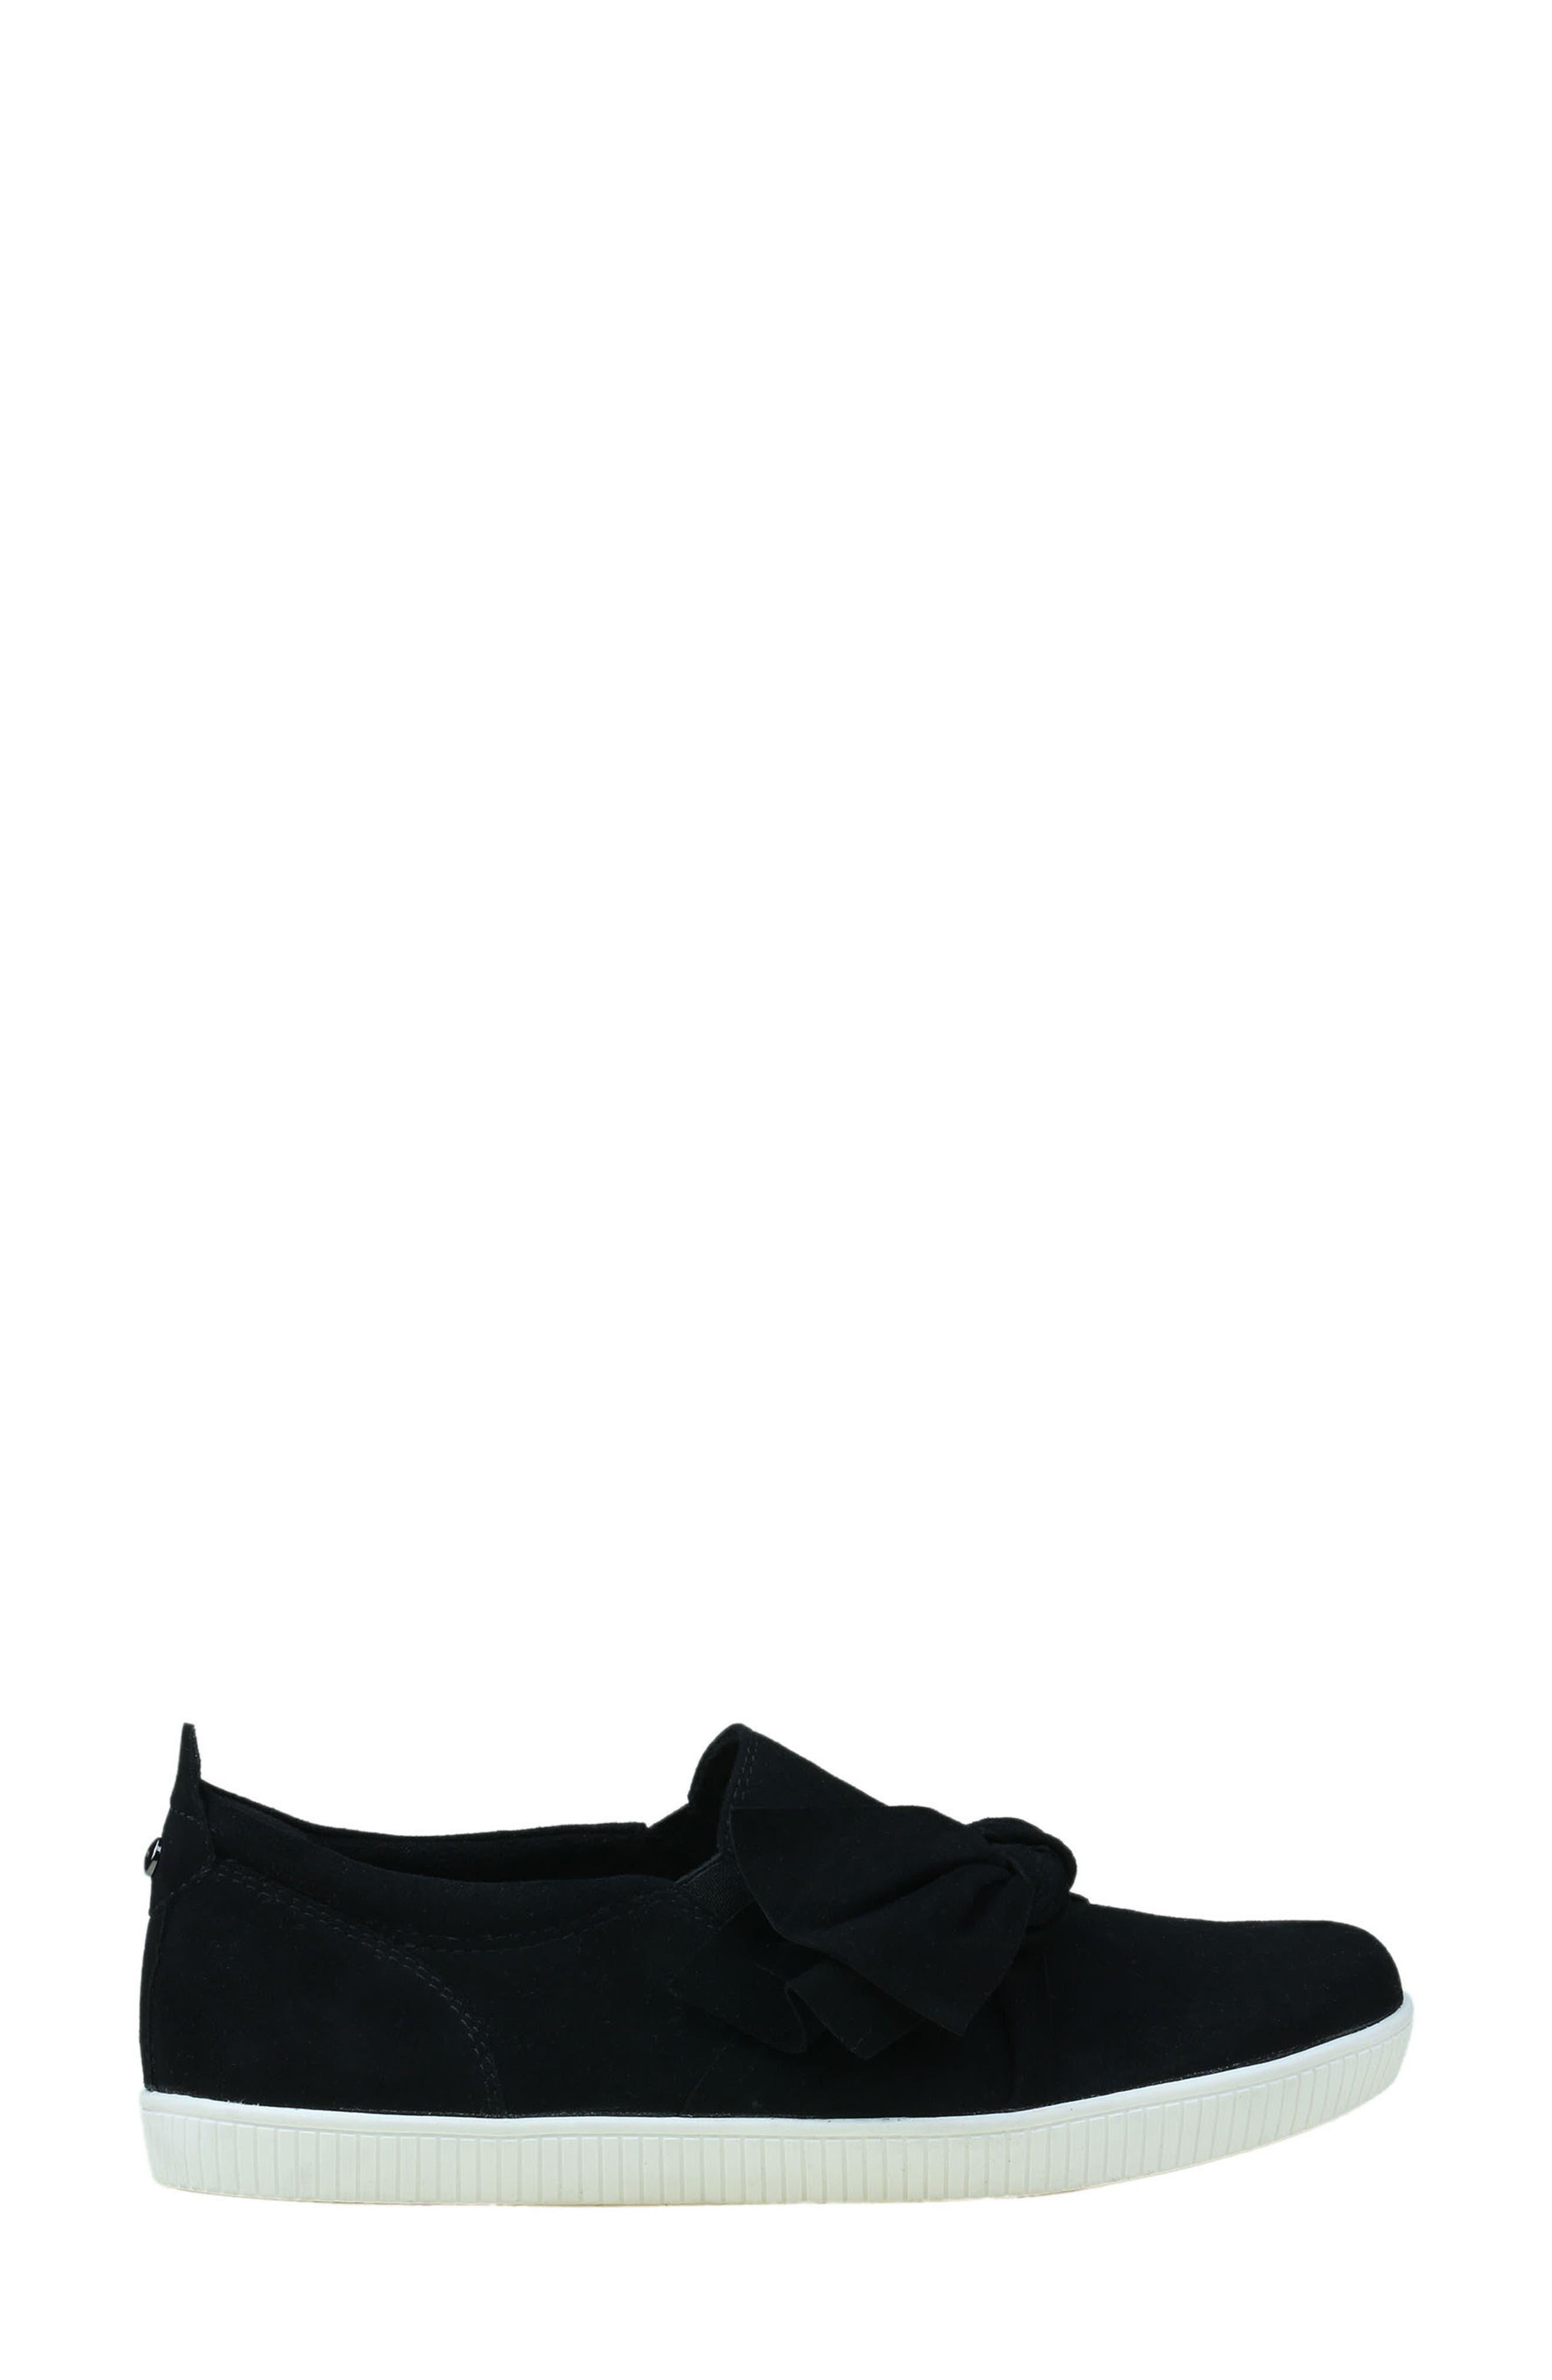 Date Sneaker,                             Alternate thumbnail 15, color,